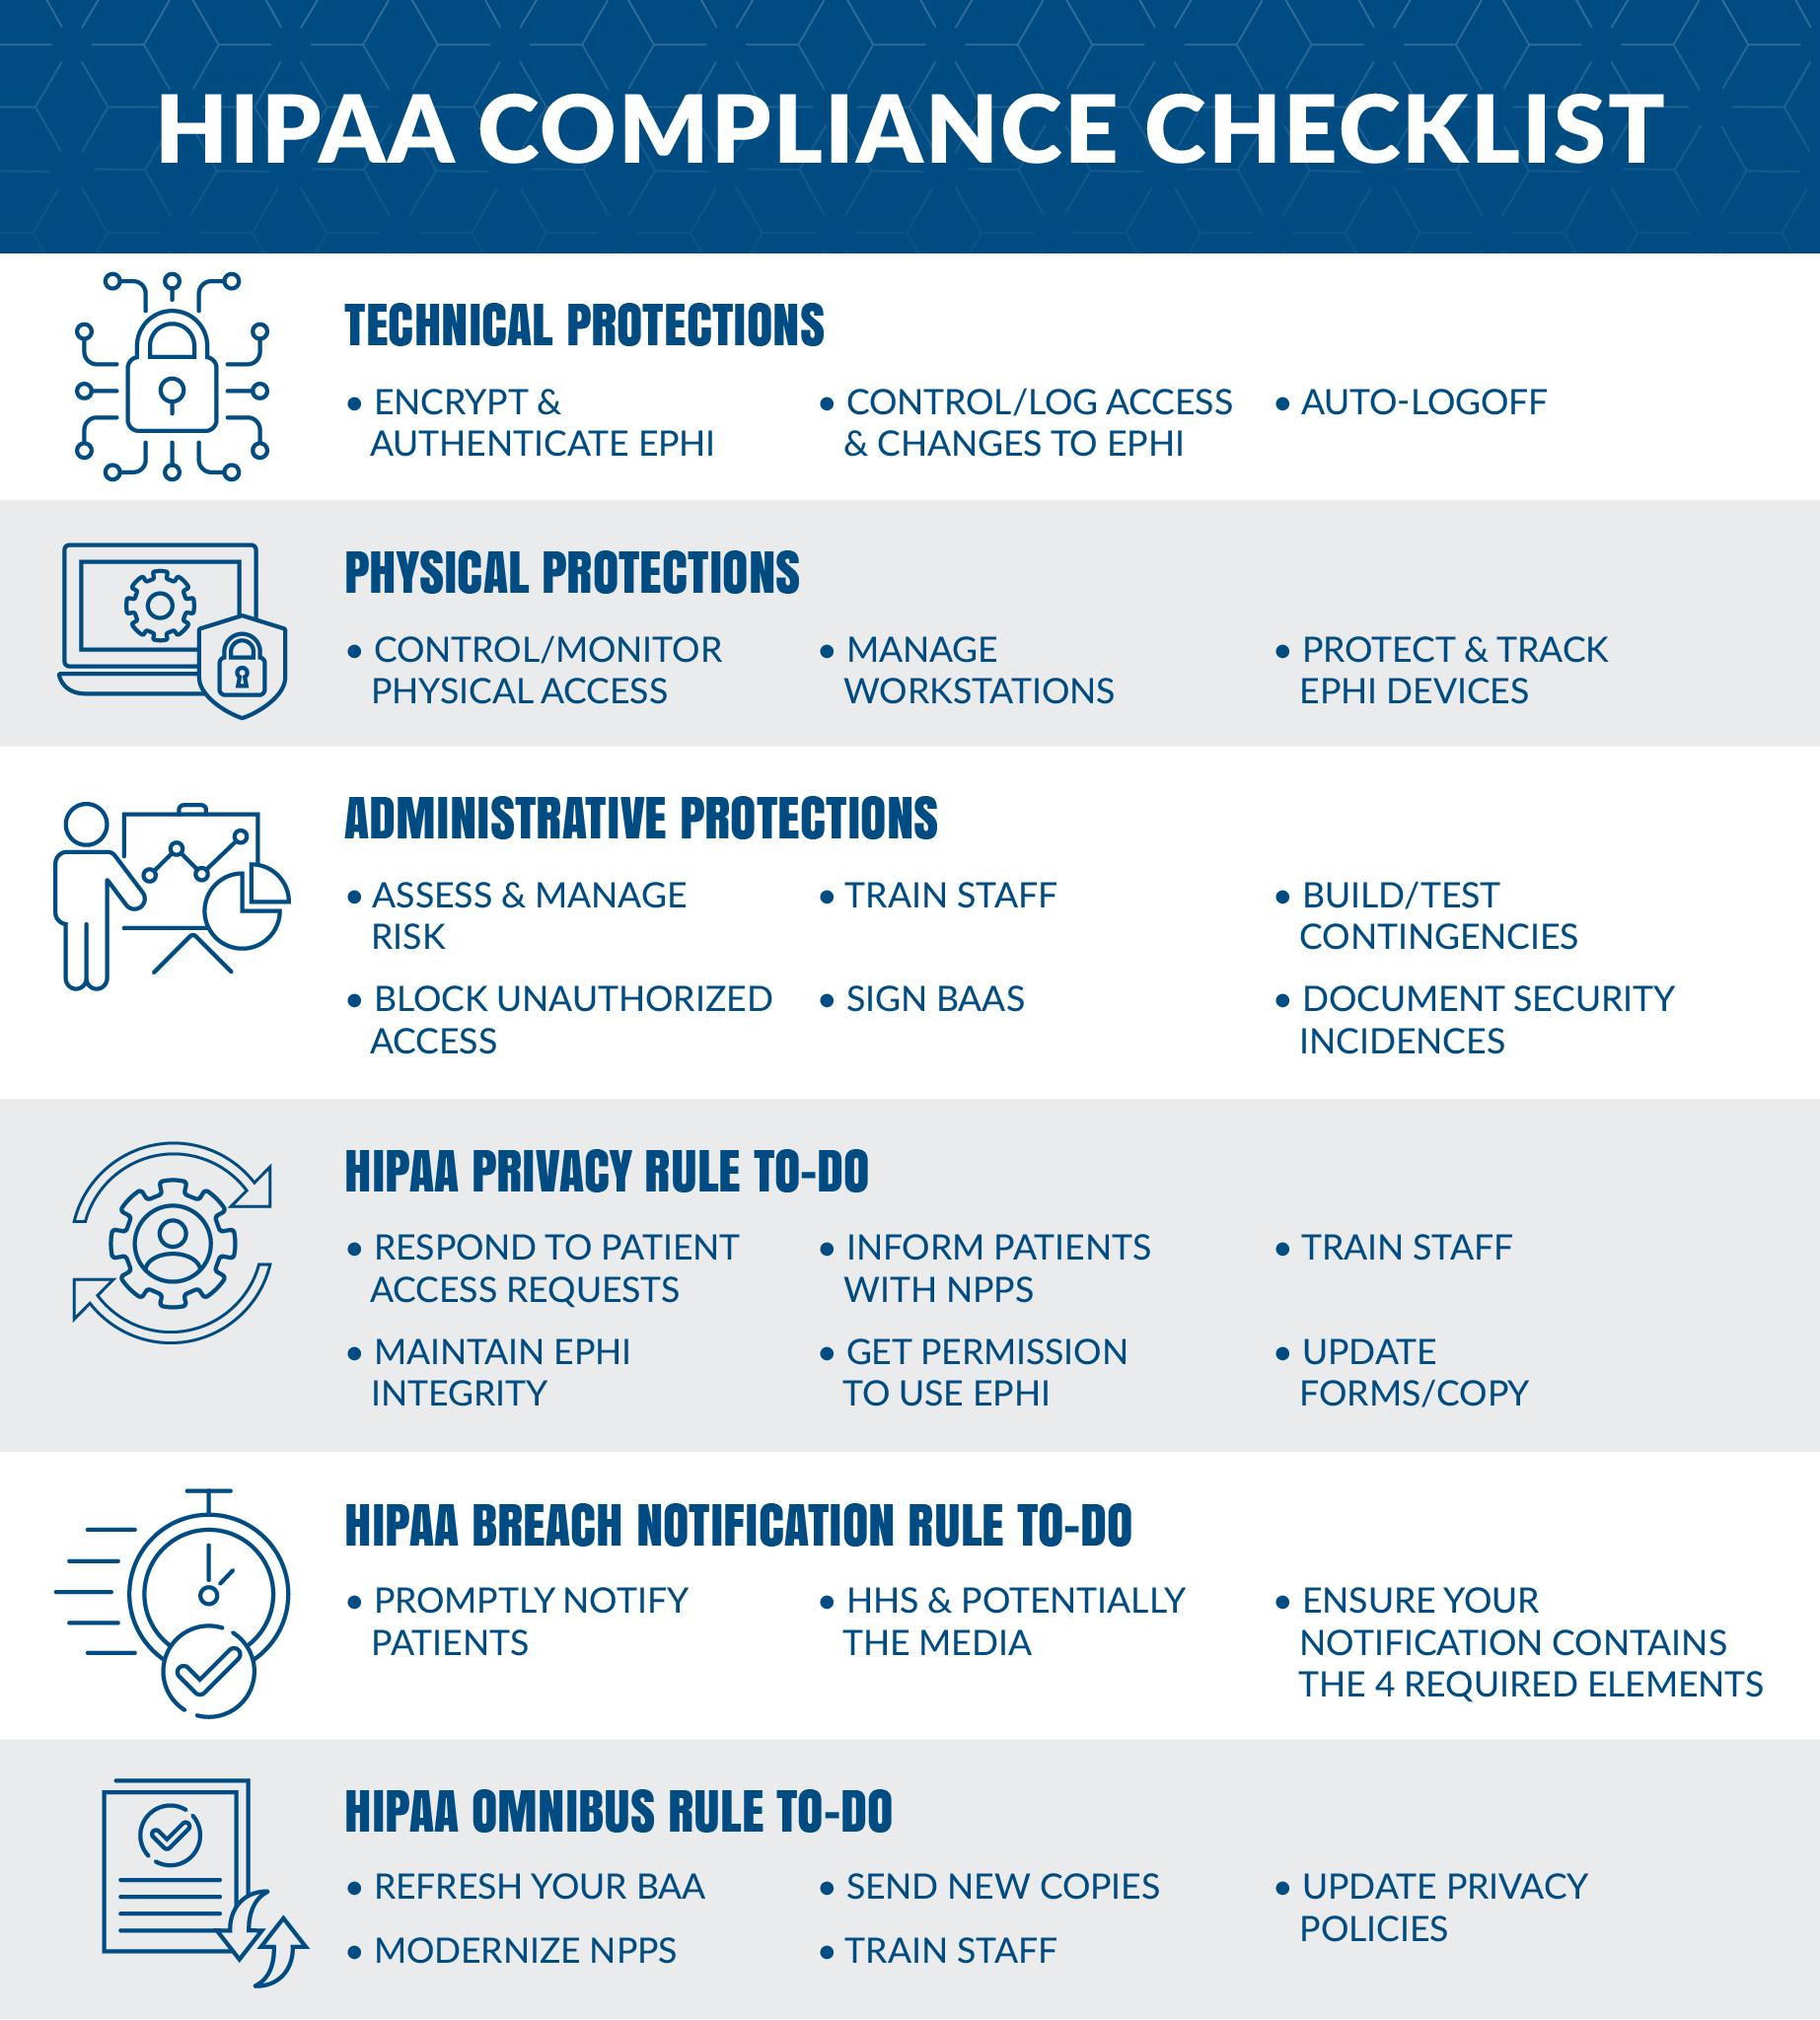 Hipaa Compliance Checklist - What Is Hipaa Compliance?